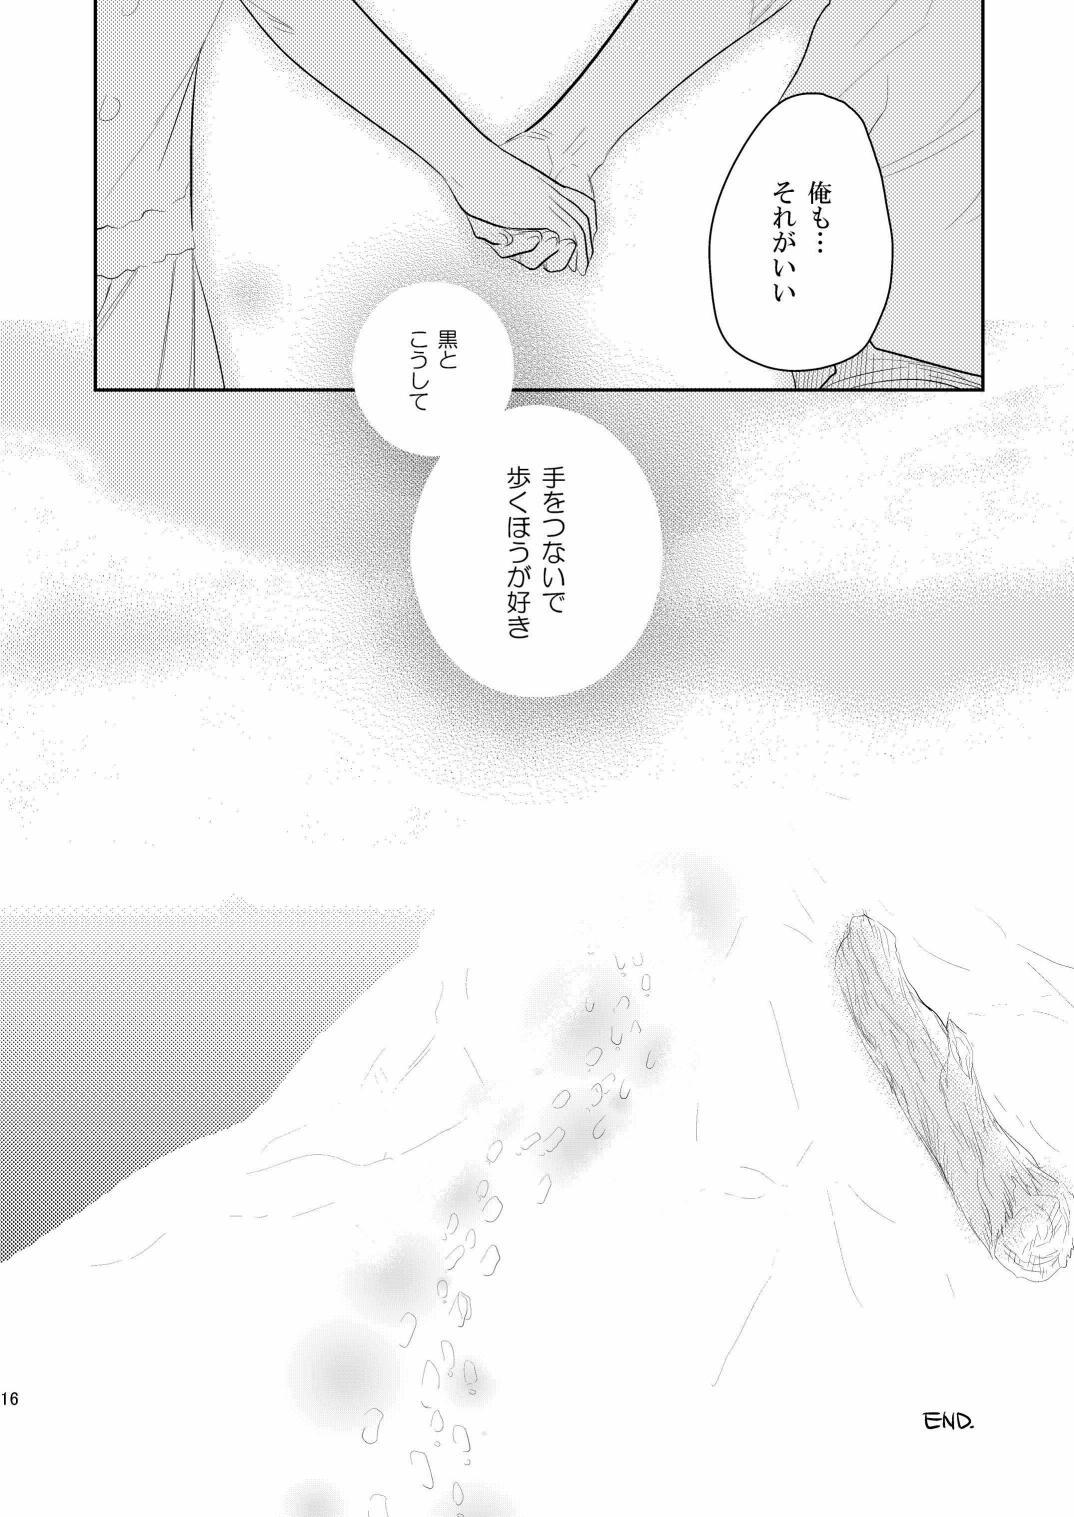 (COMIC1☆4) [AHM (Inu-Blade, Lact Mangan)] Kuroda (Tsuma) Shichihenge (DARKER THAN BLACK) 14